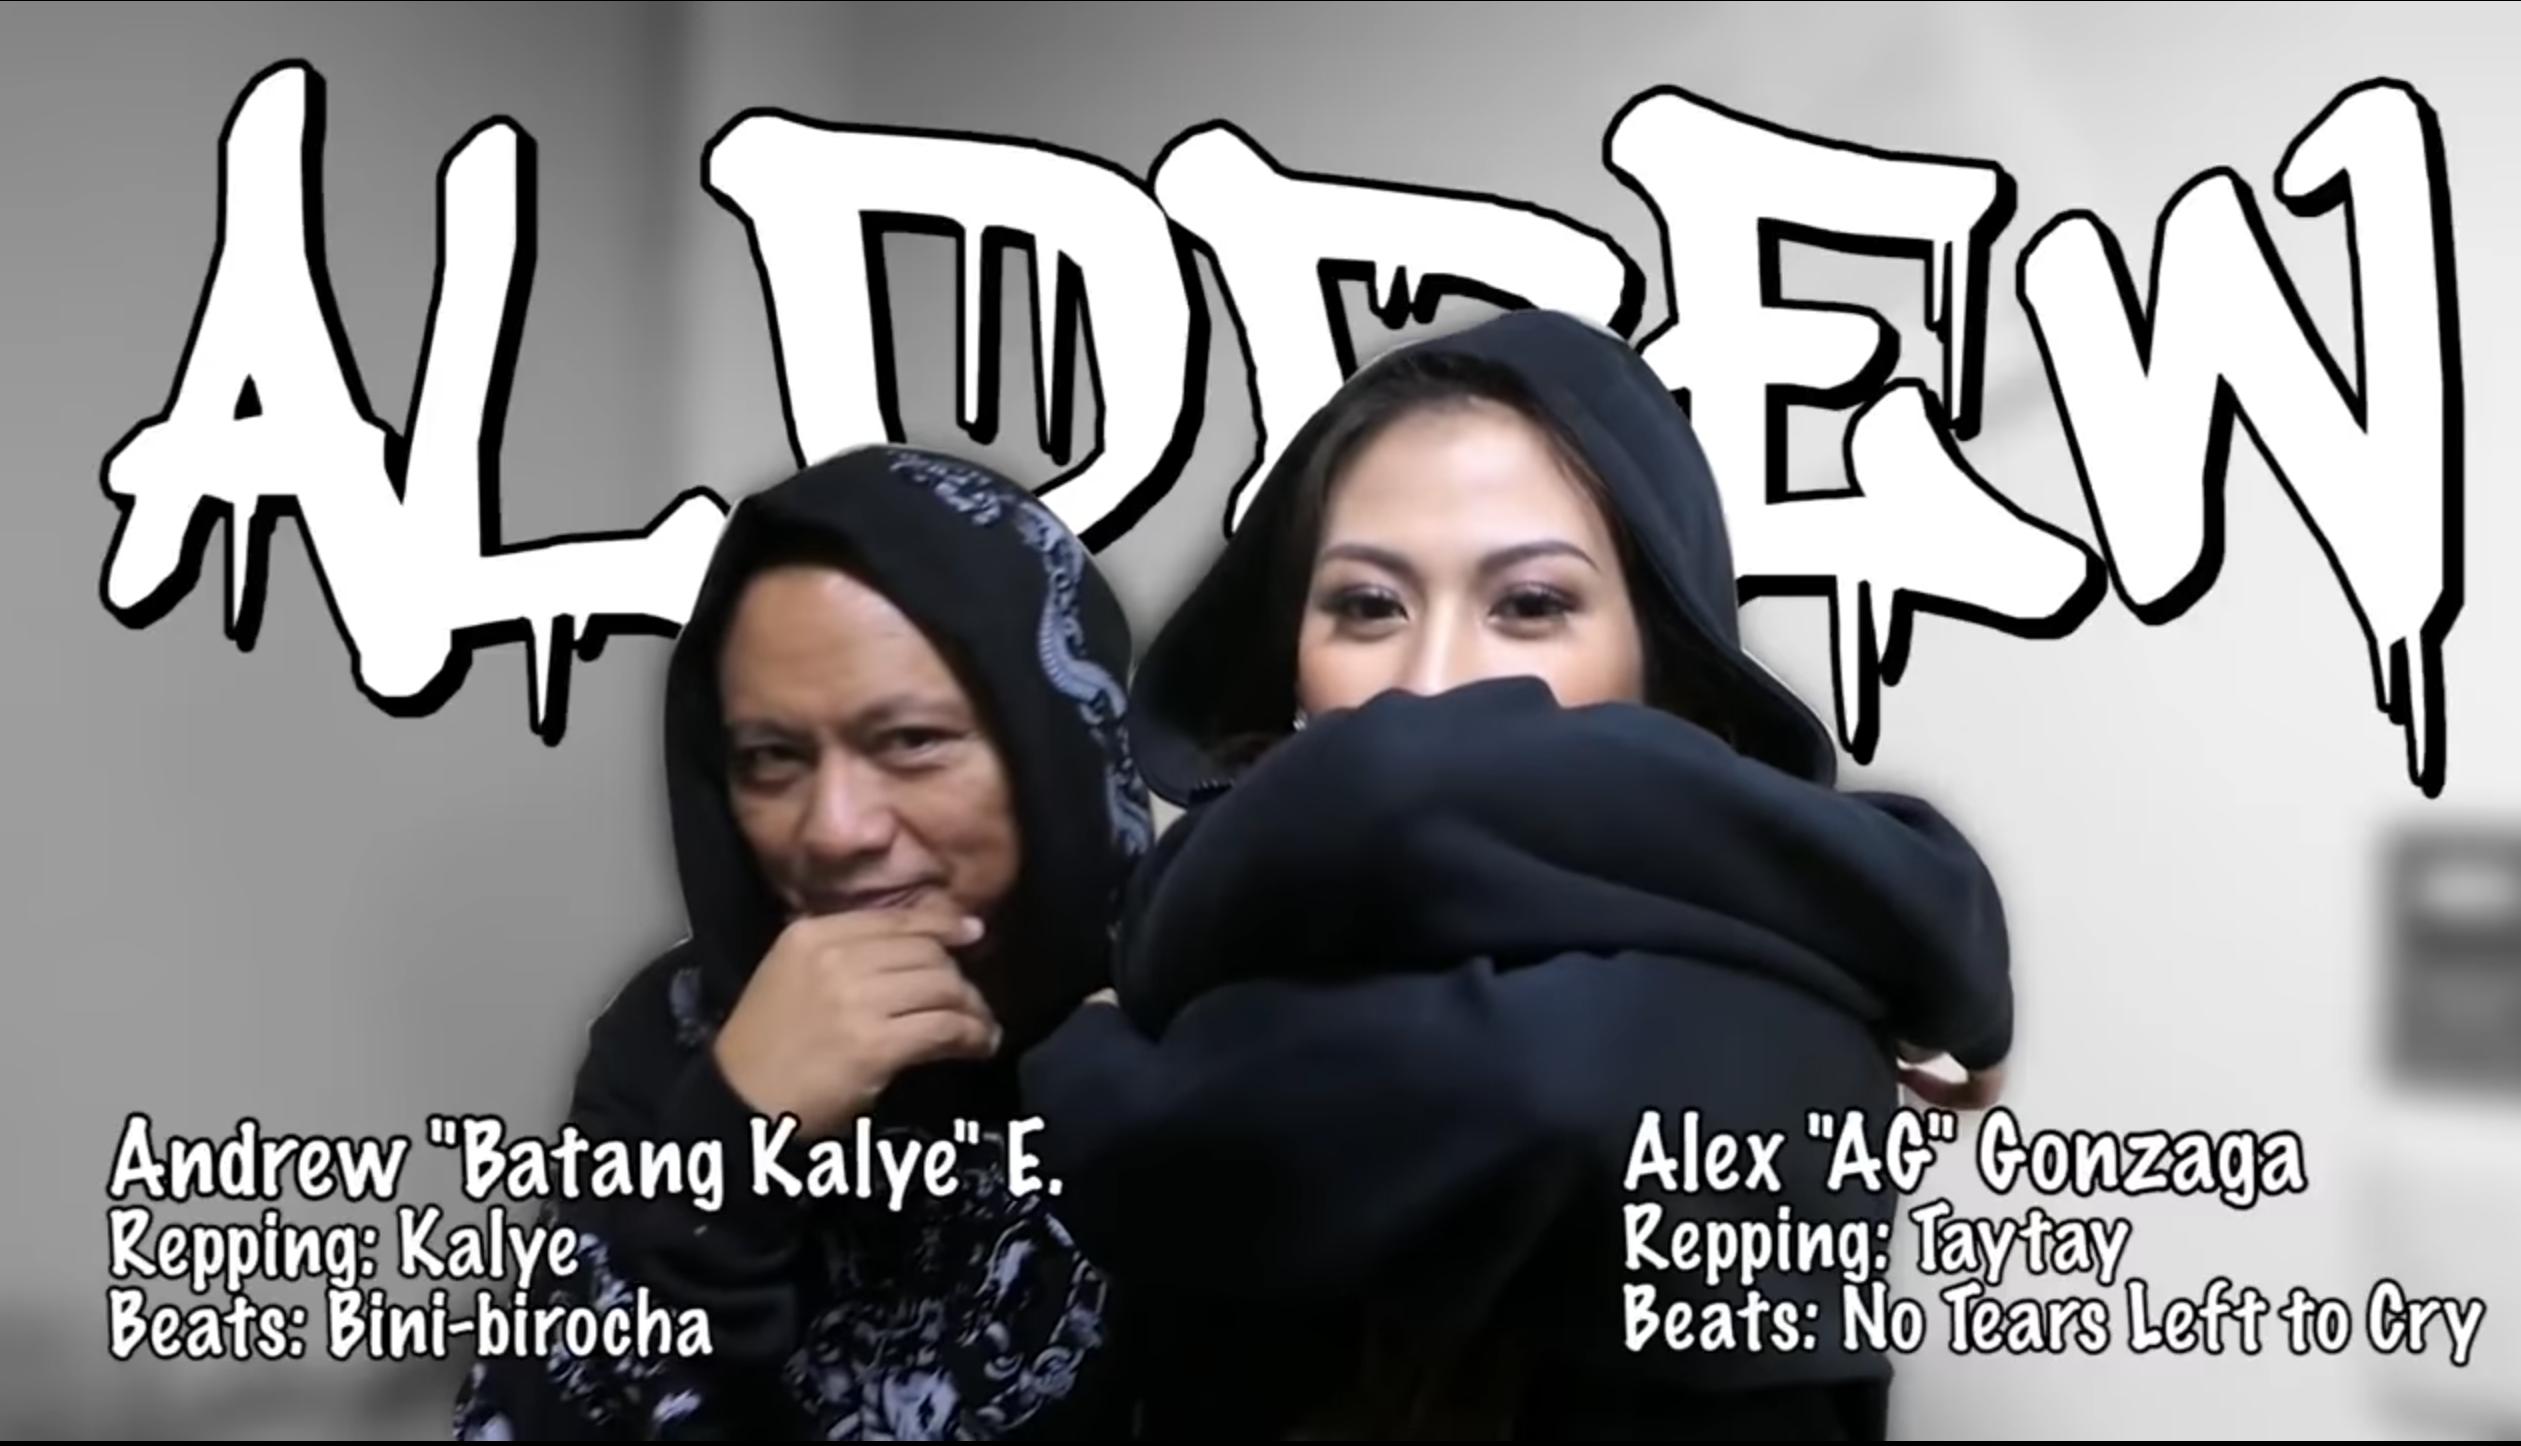 WATCH: Alex Gonzaga pursuing a new career as a rapper?